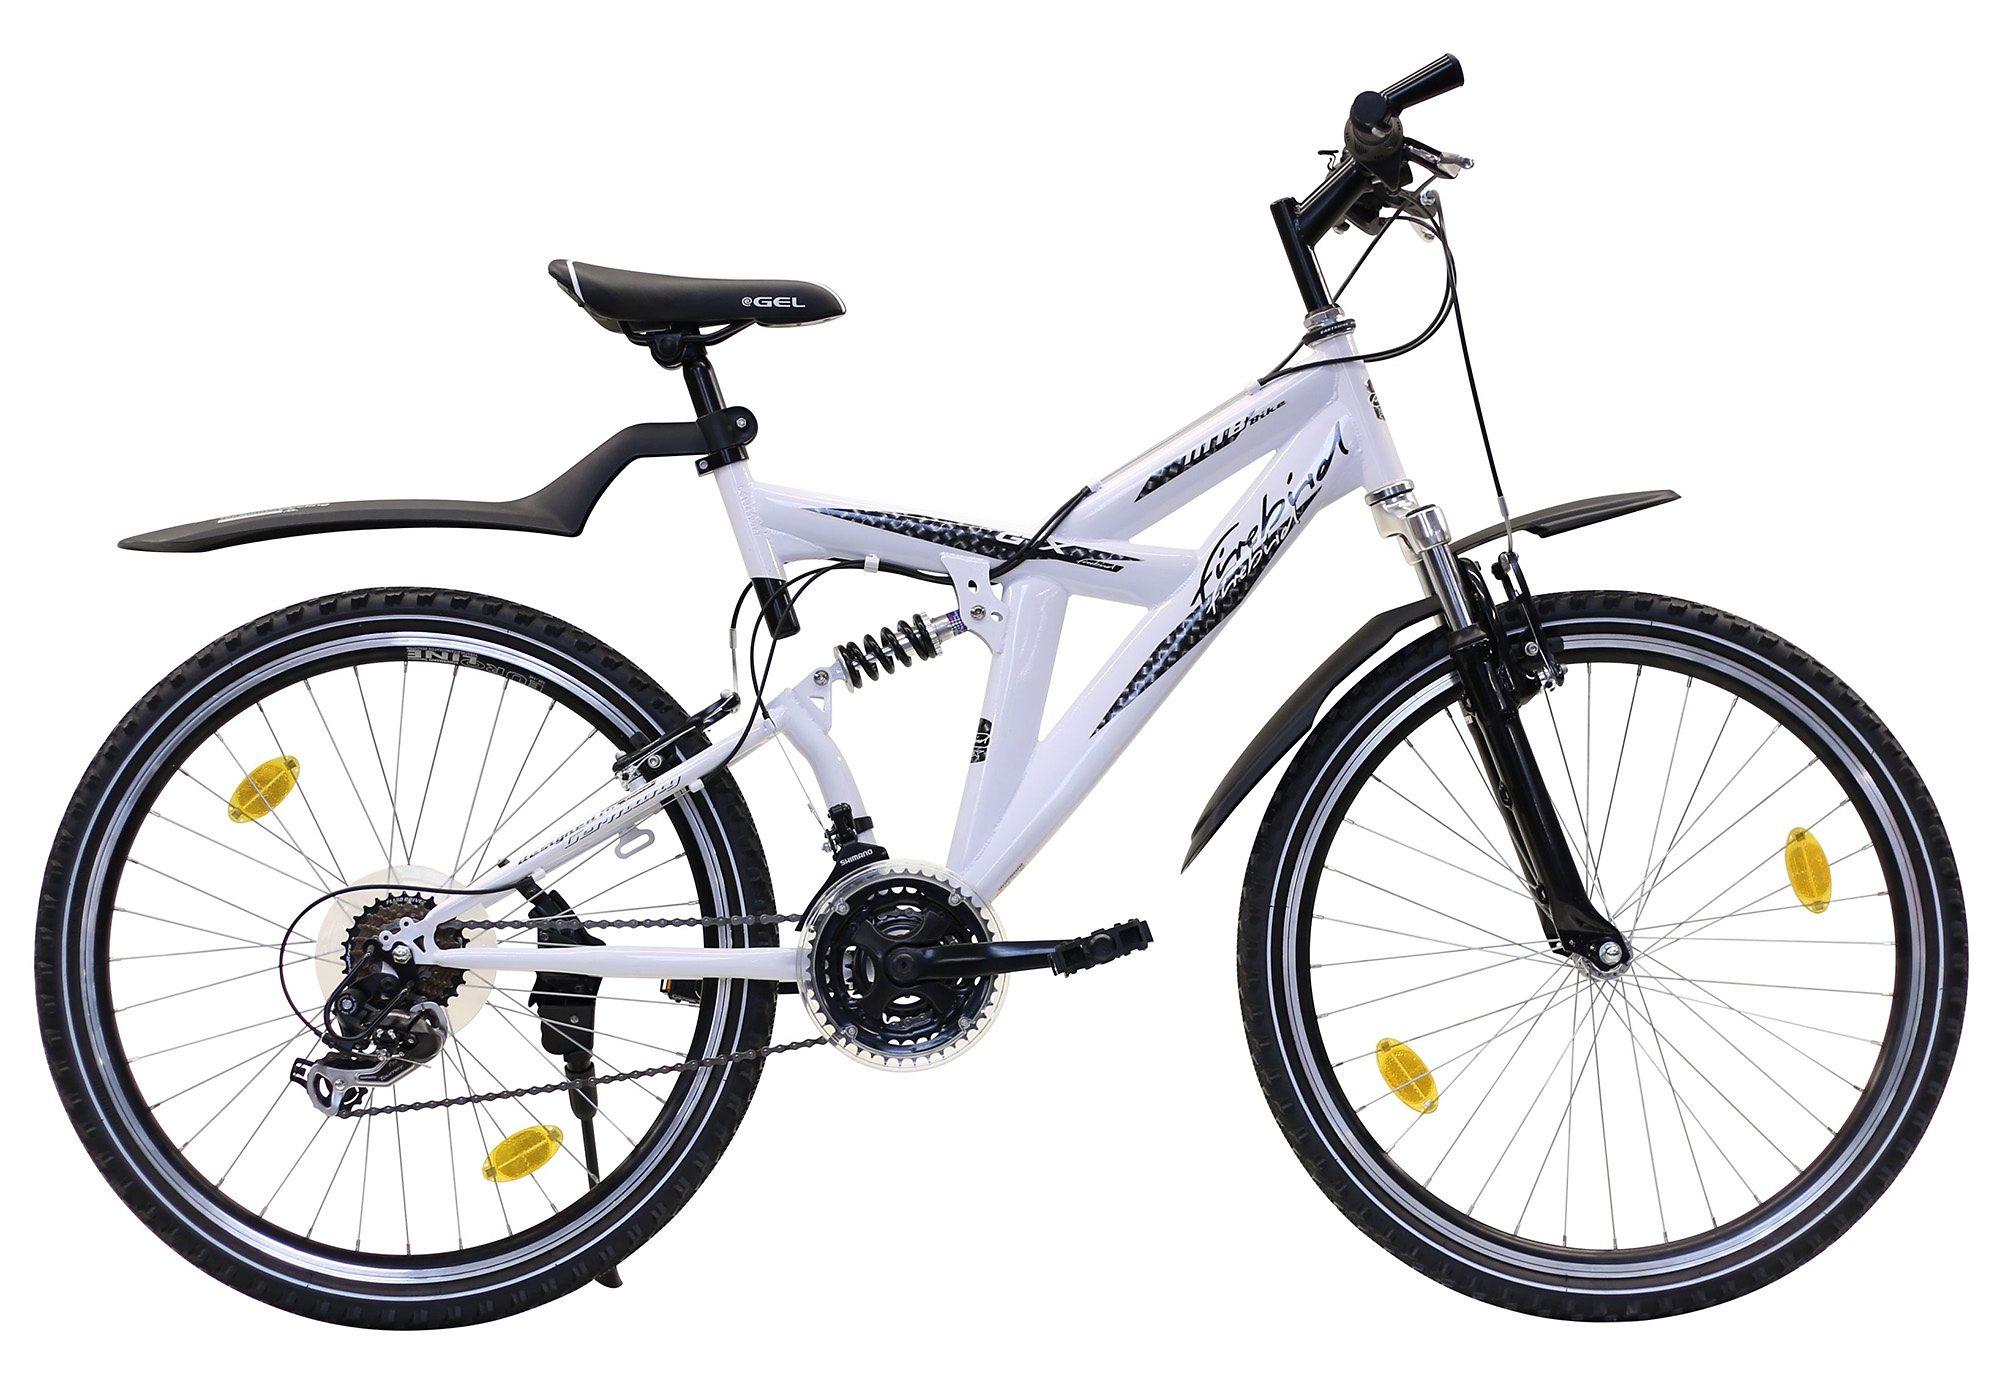 Fully Mountainbike, 26 Zoll, 21 Gang Shimano TX 35, V-Brakes, ohne Beleuchtung, Firebird